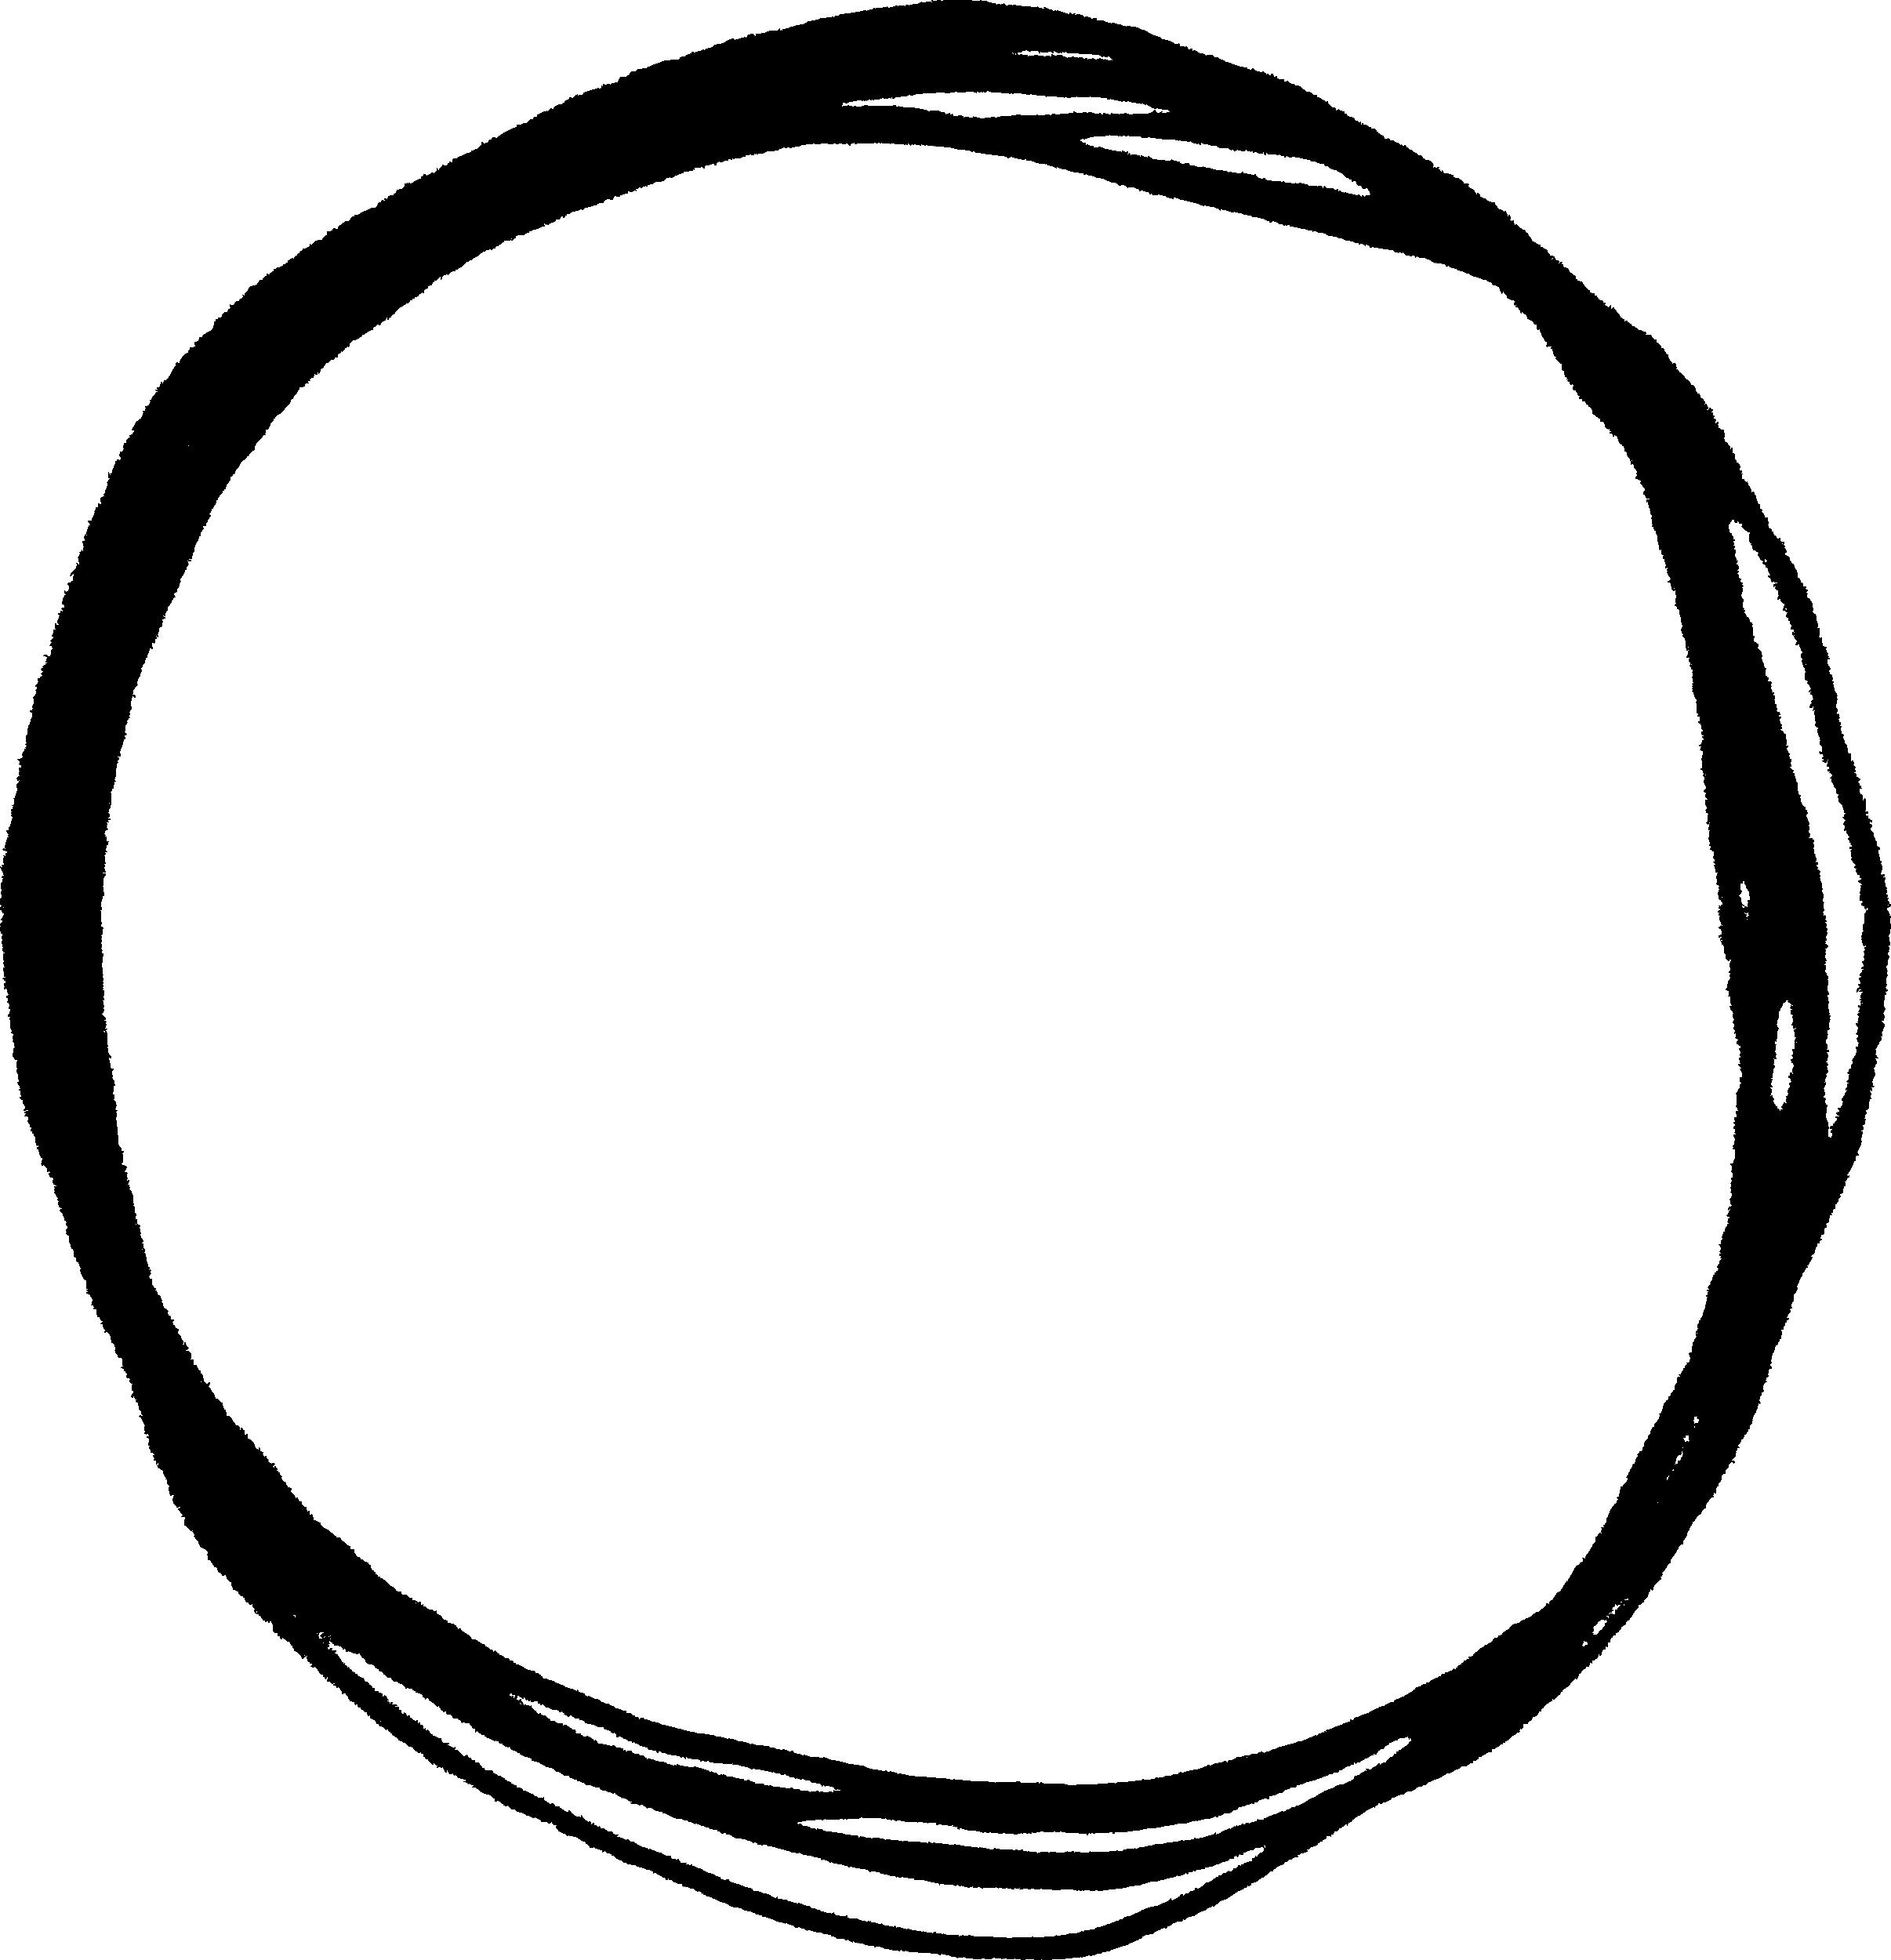 scribble png transparent. Clipart circle doodle